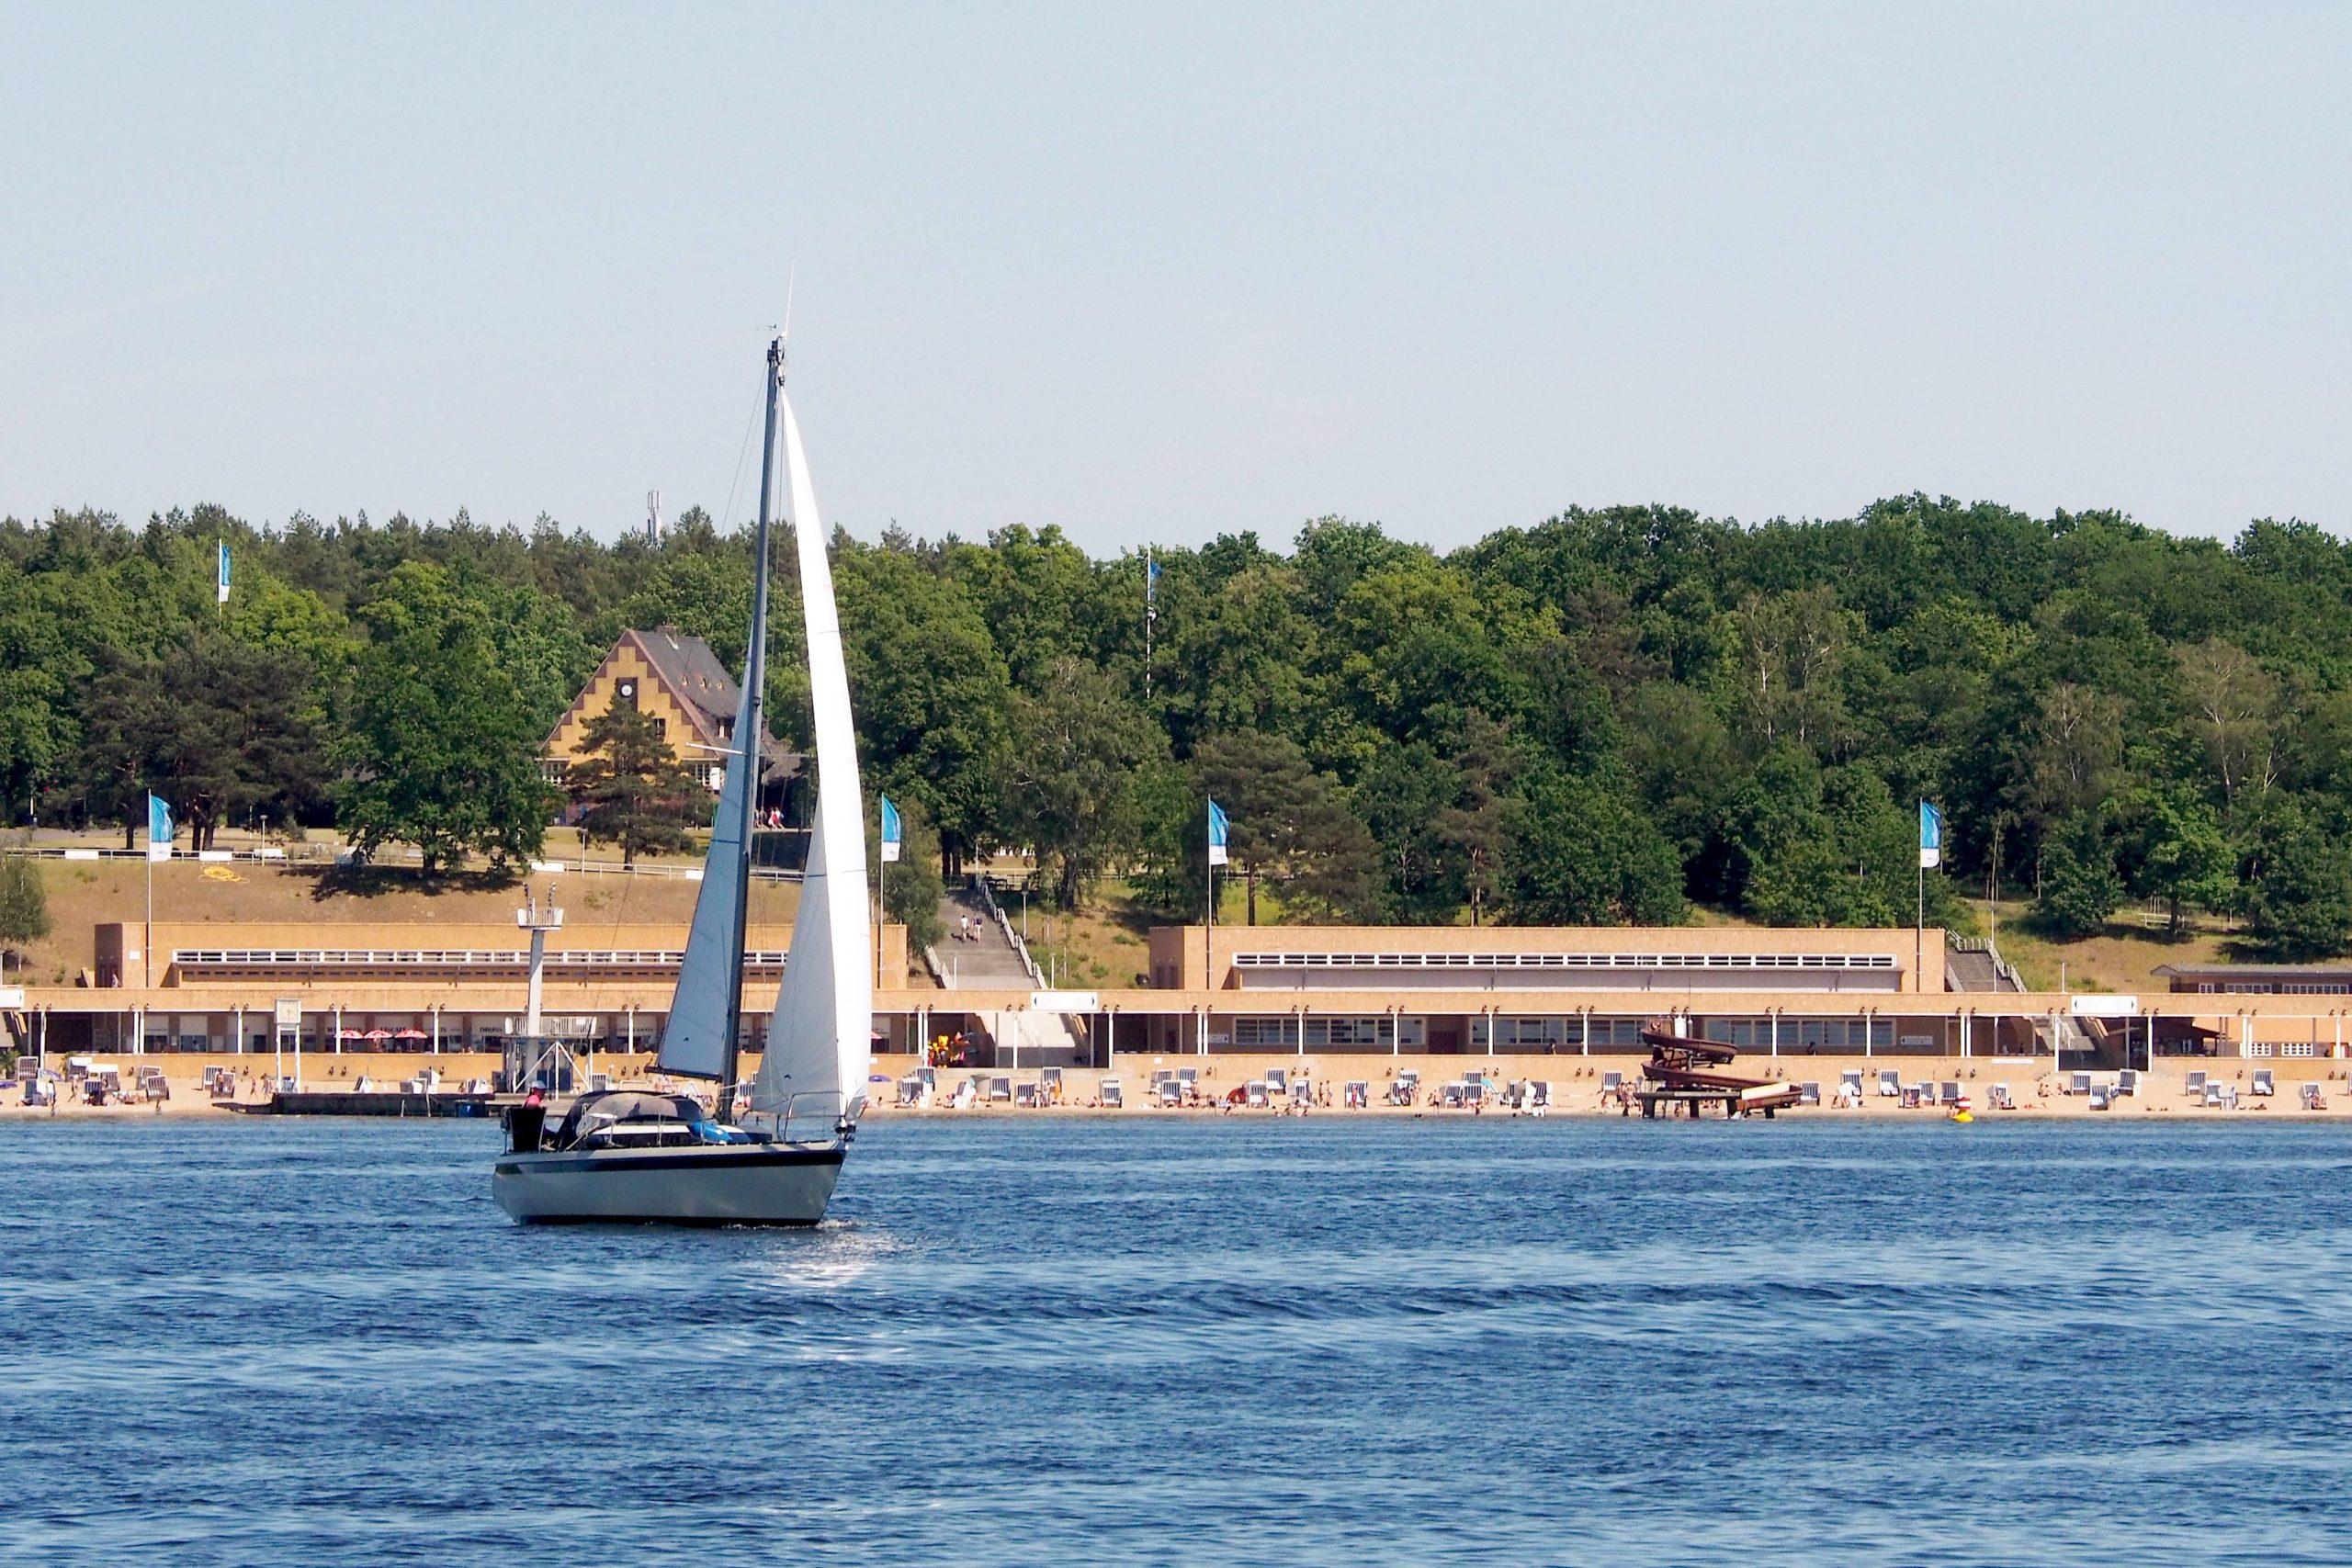 Der Klassiker unter den Berliner Strandbädern: der Wannsee. Foto: Imago/Tom Maelsa